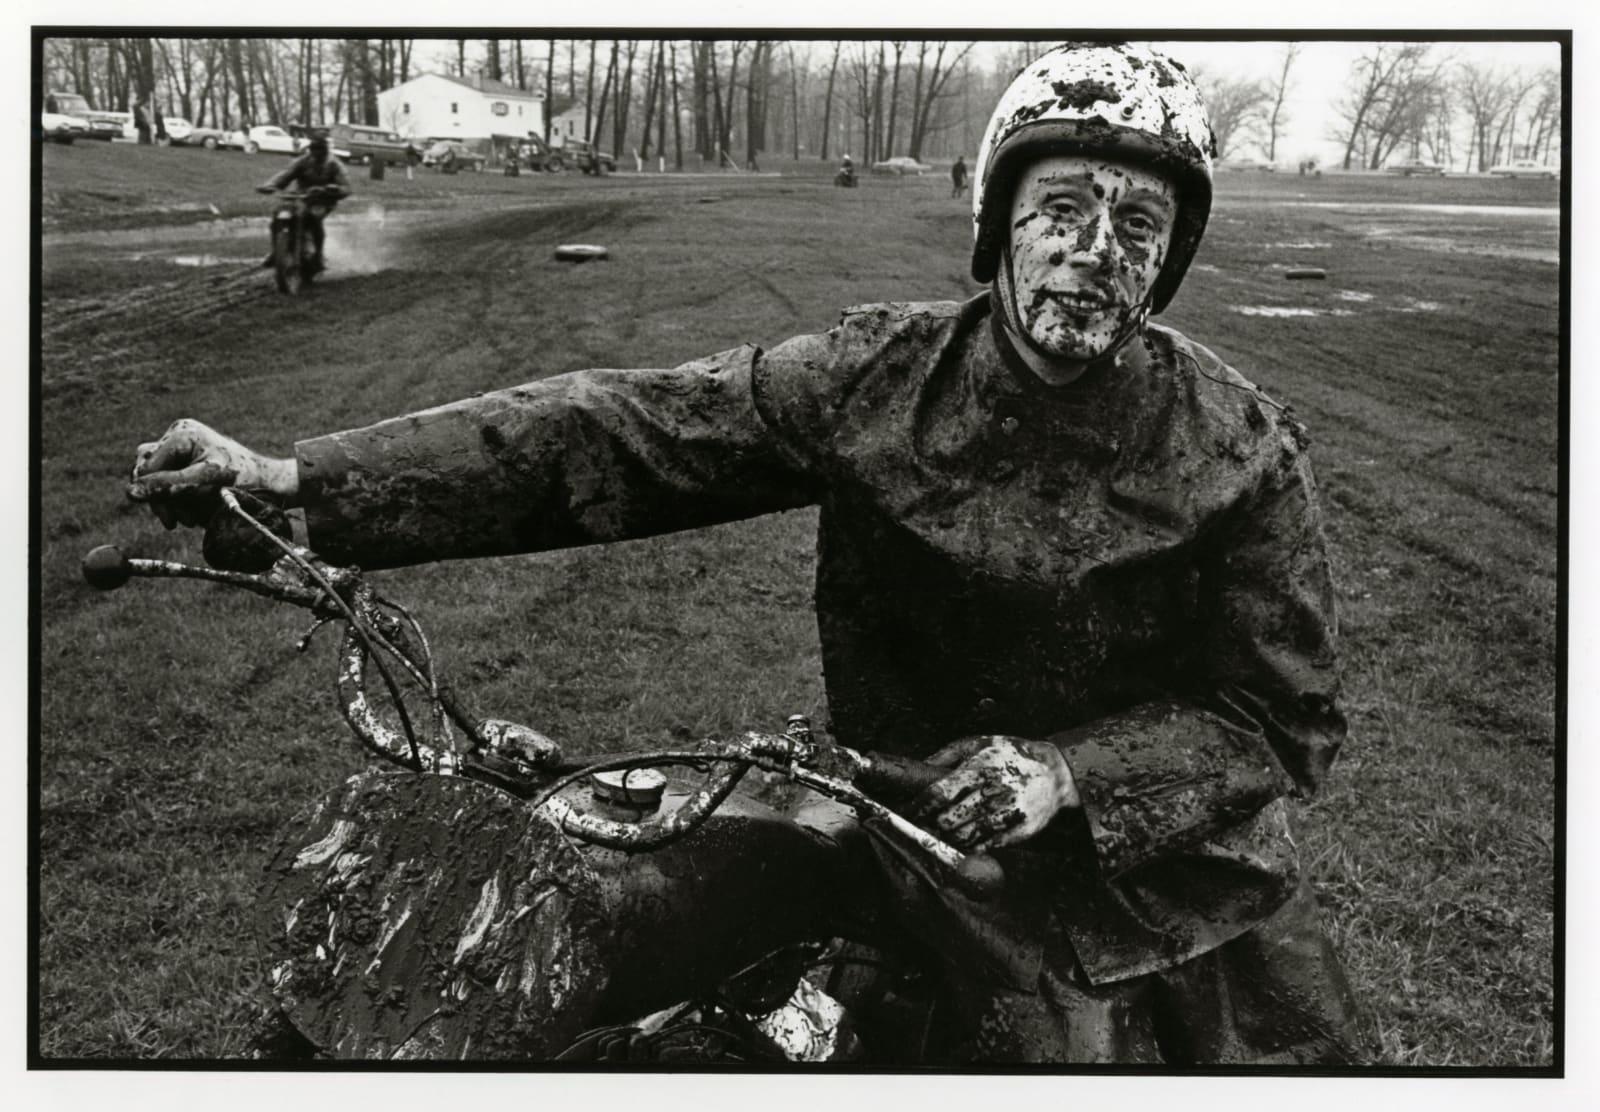 Danny Lyon - Racer, Schererville, Indiana, 1965